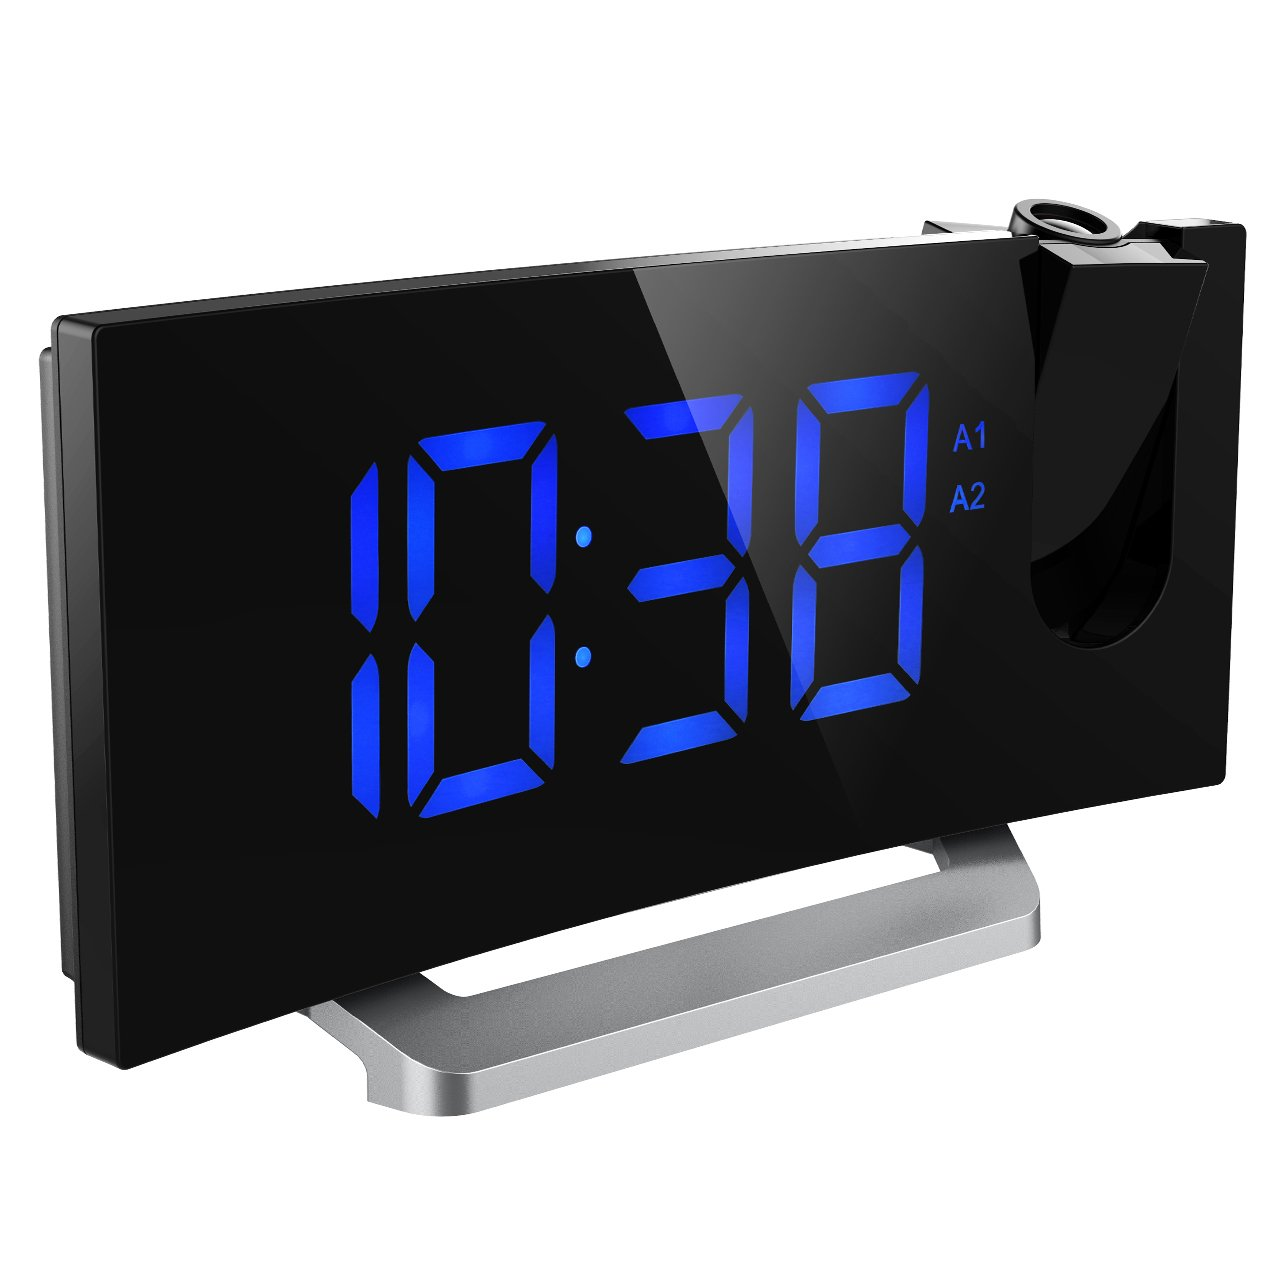 r2d2 projection alarm clock instructions